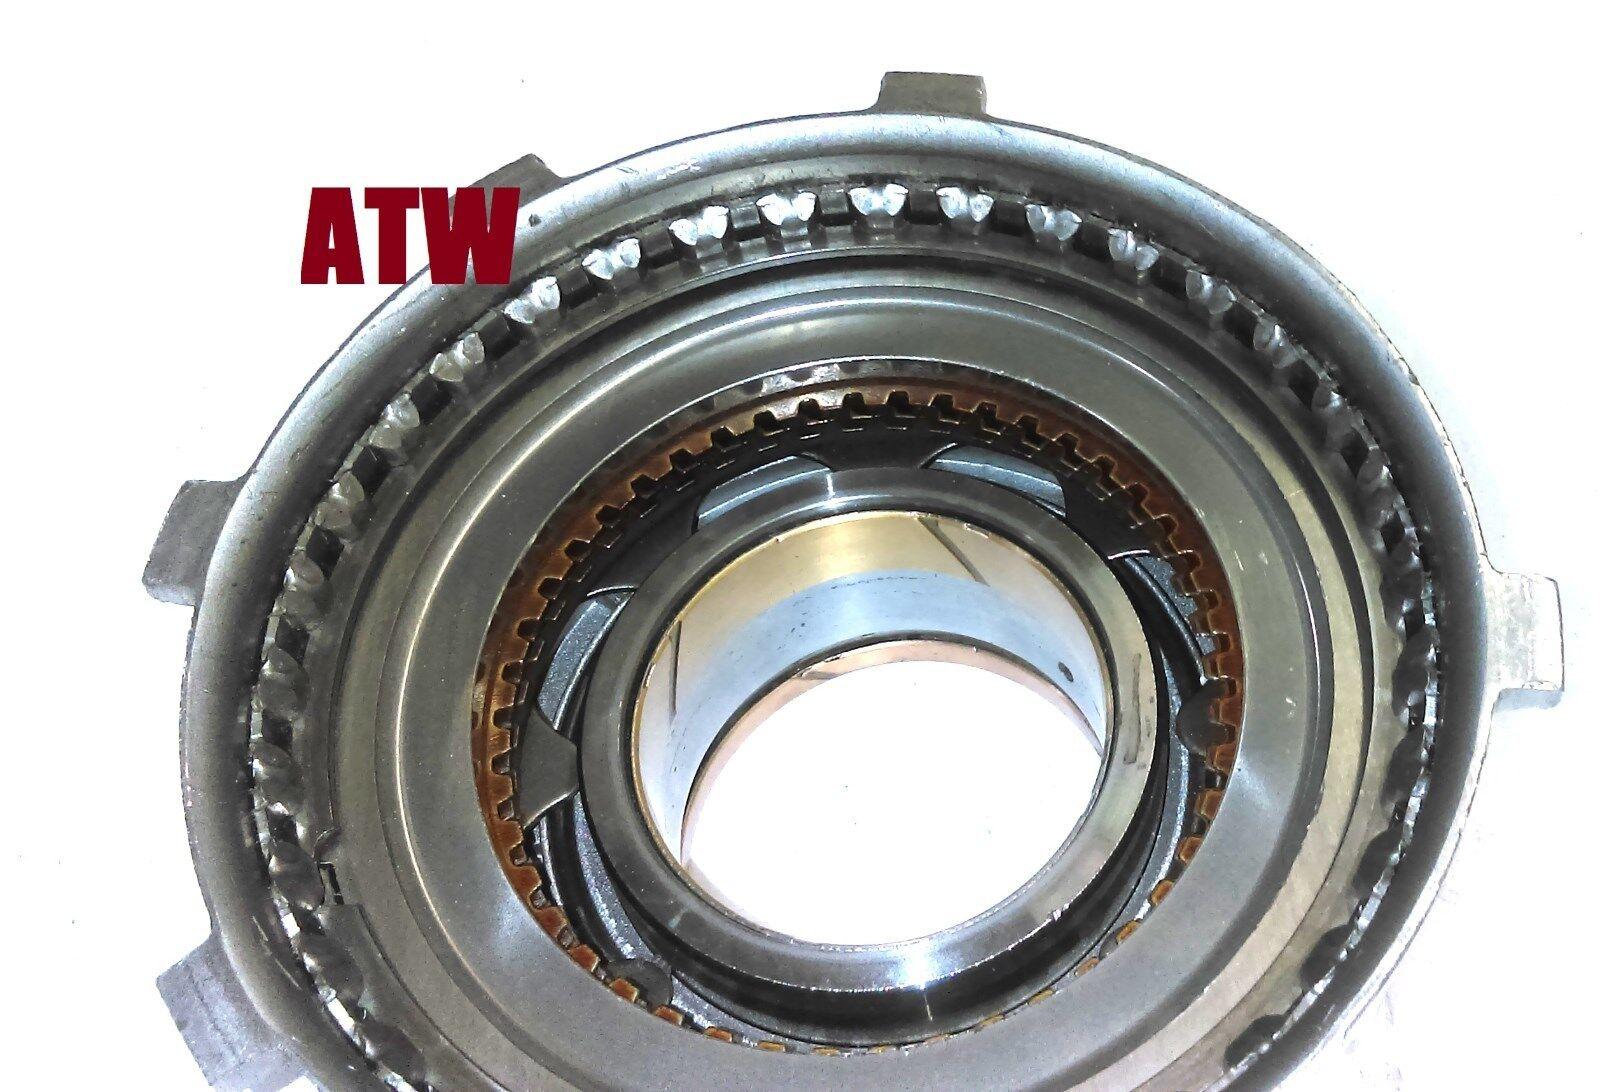 AODE 4R70W 4R75W Transmission Reverse Drum Rachet Style Mechanical Diode Sprag